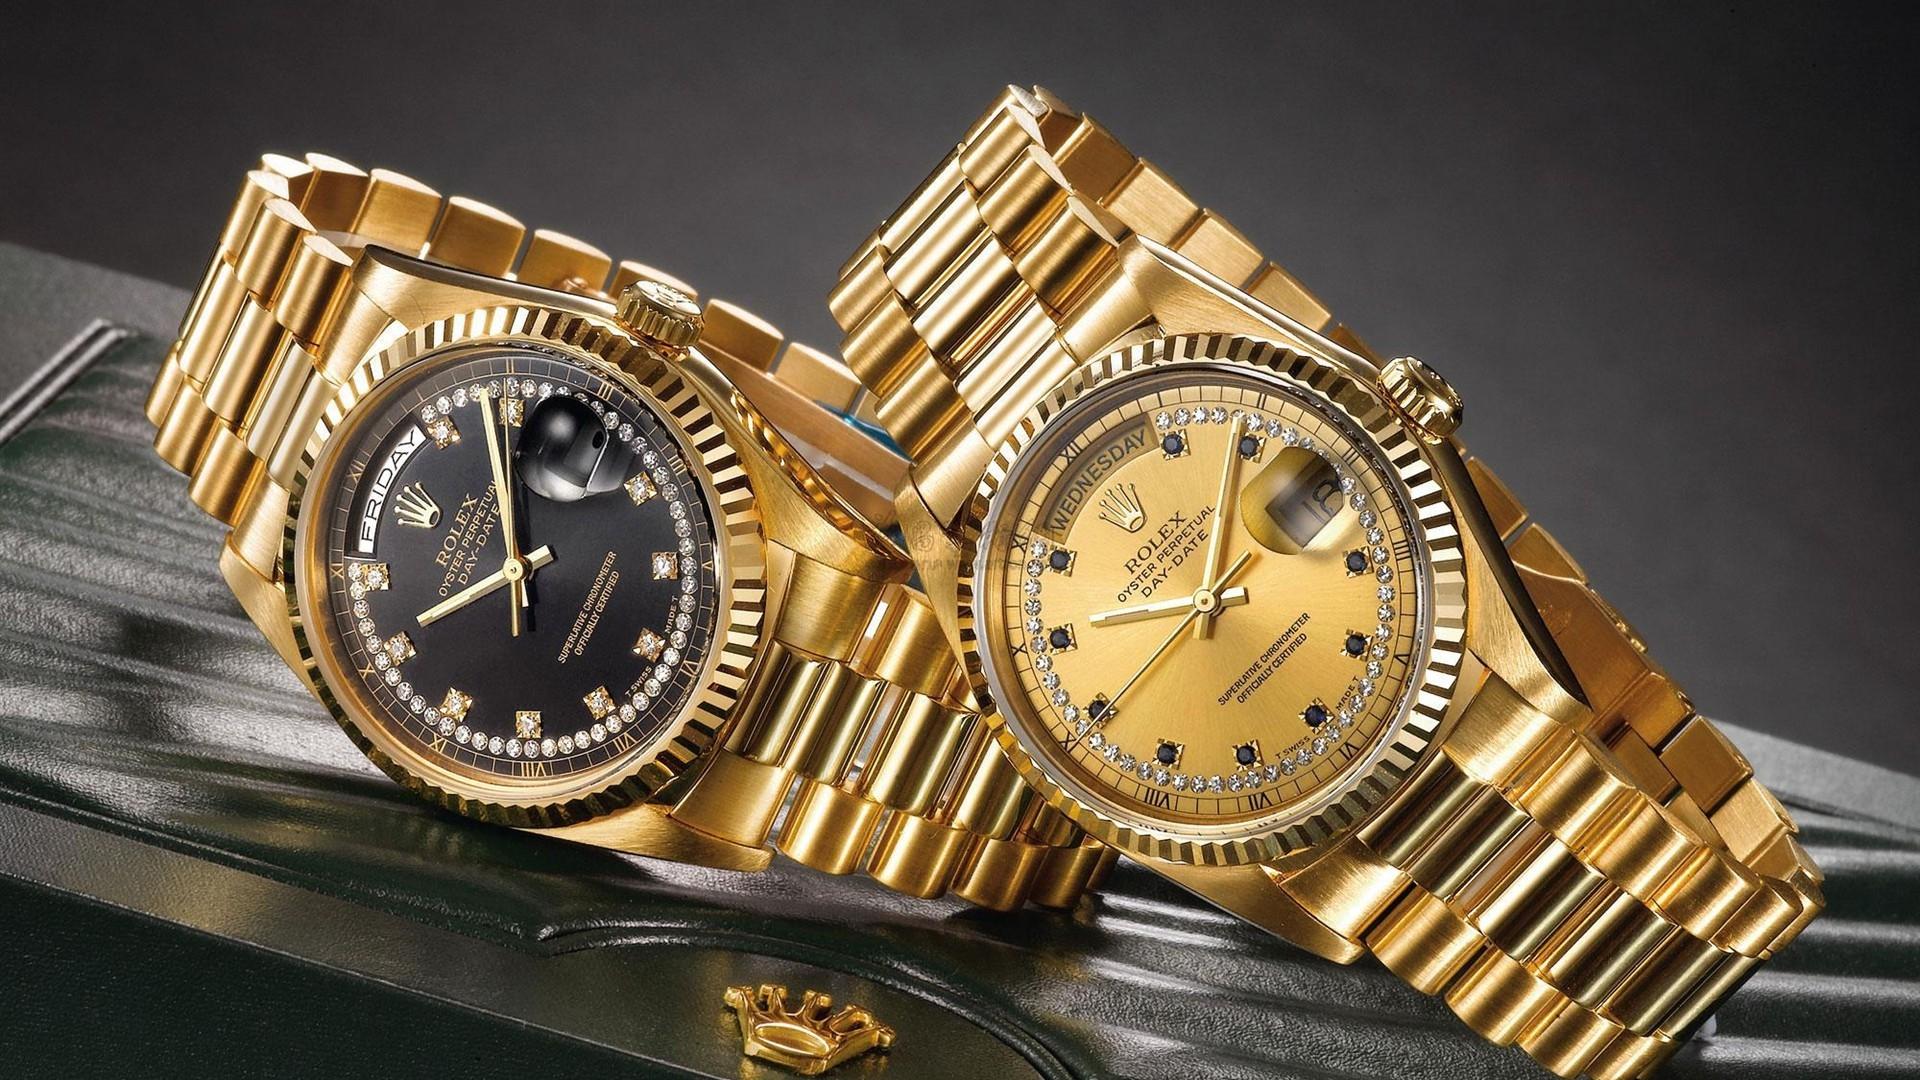 Rolex : Le comble du luxe et de lu2019u00e9lu00e9gance fu00e9minine